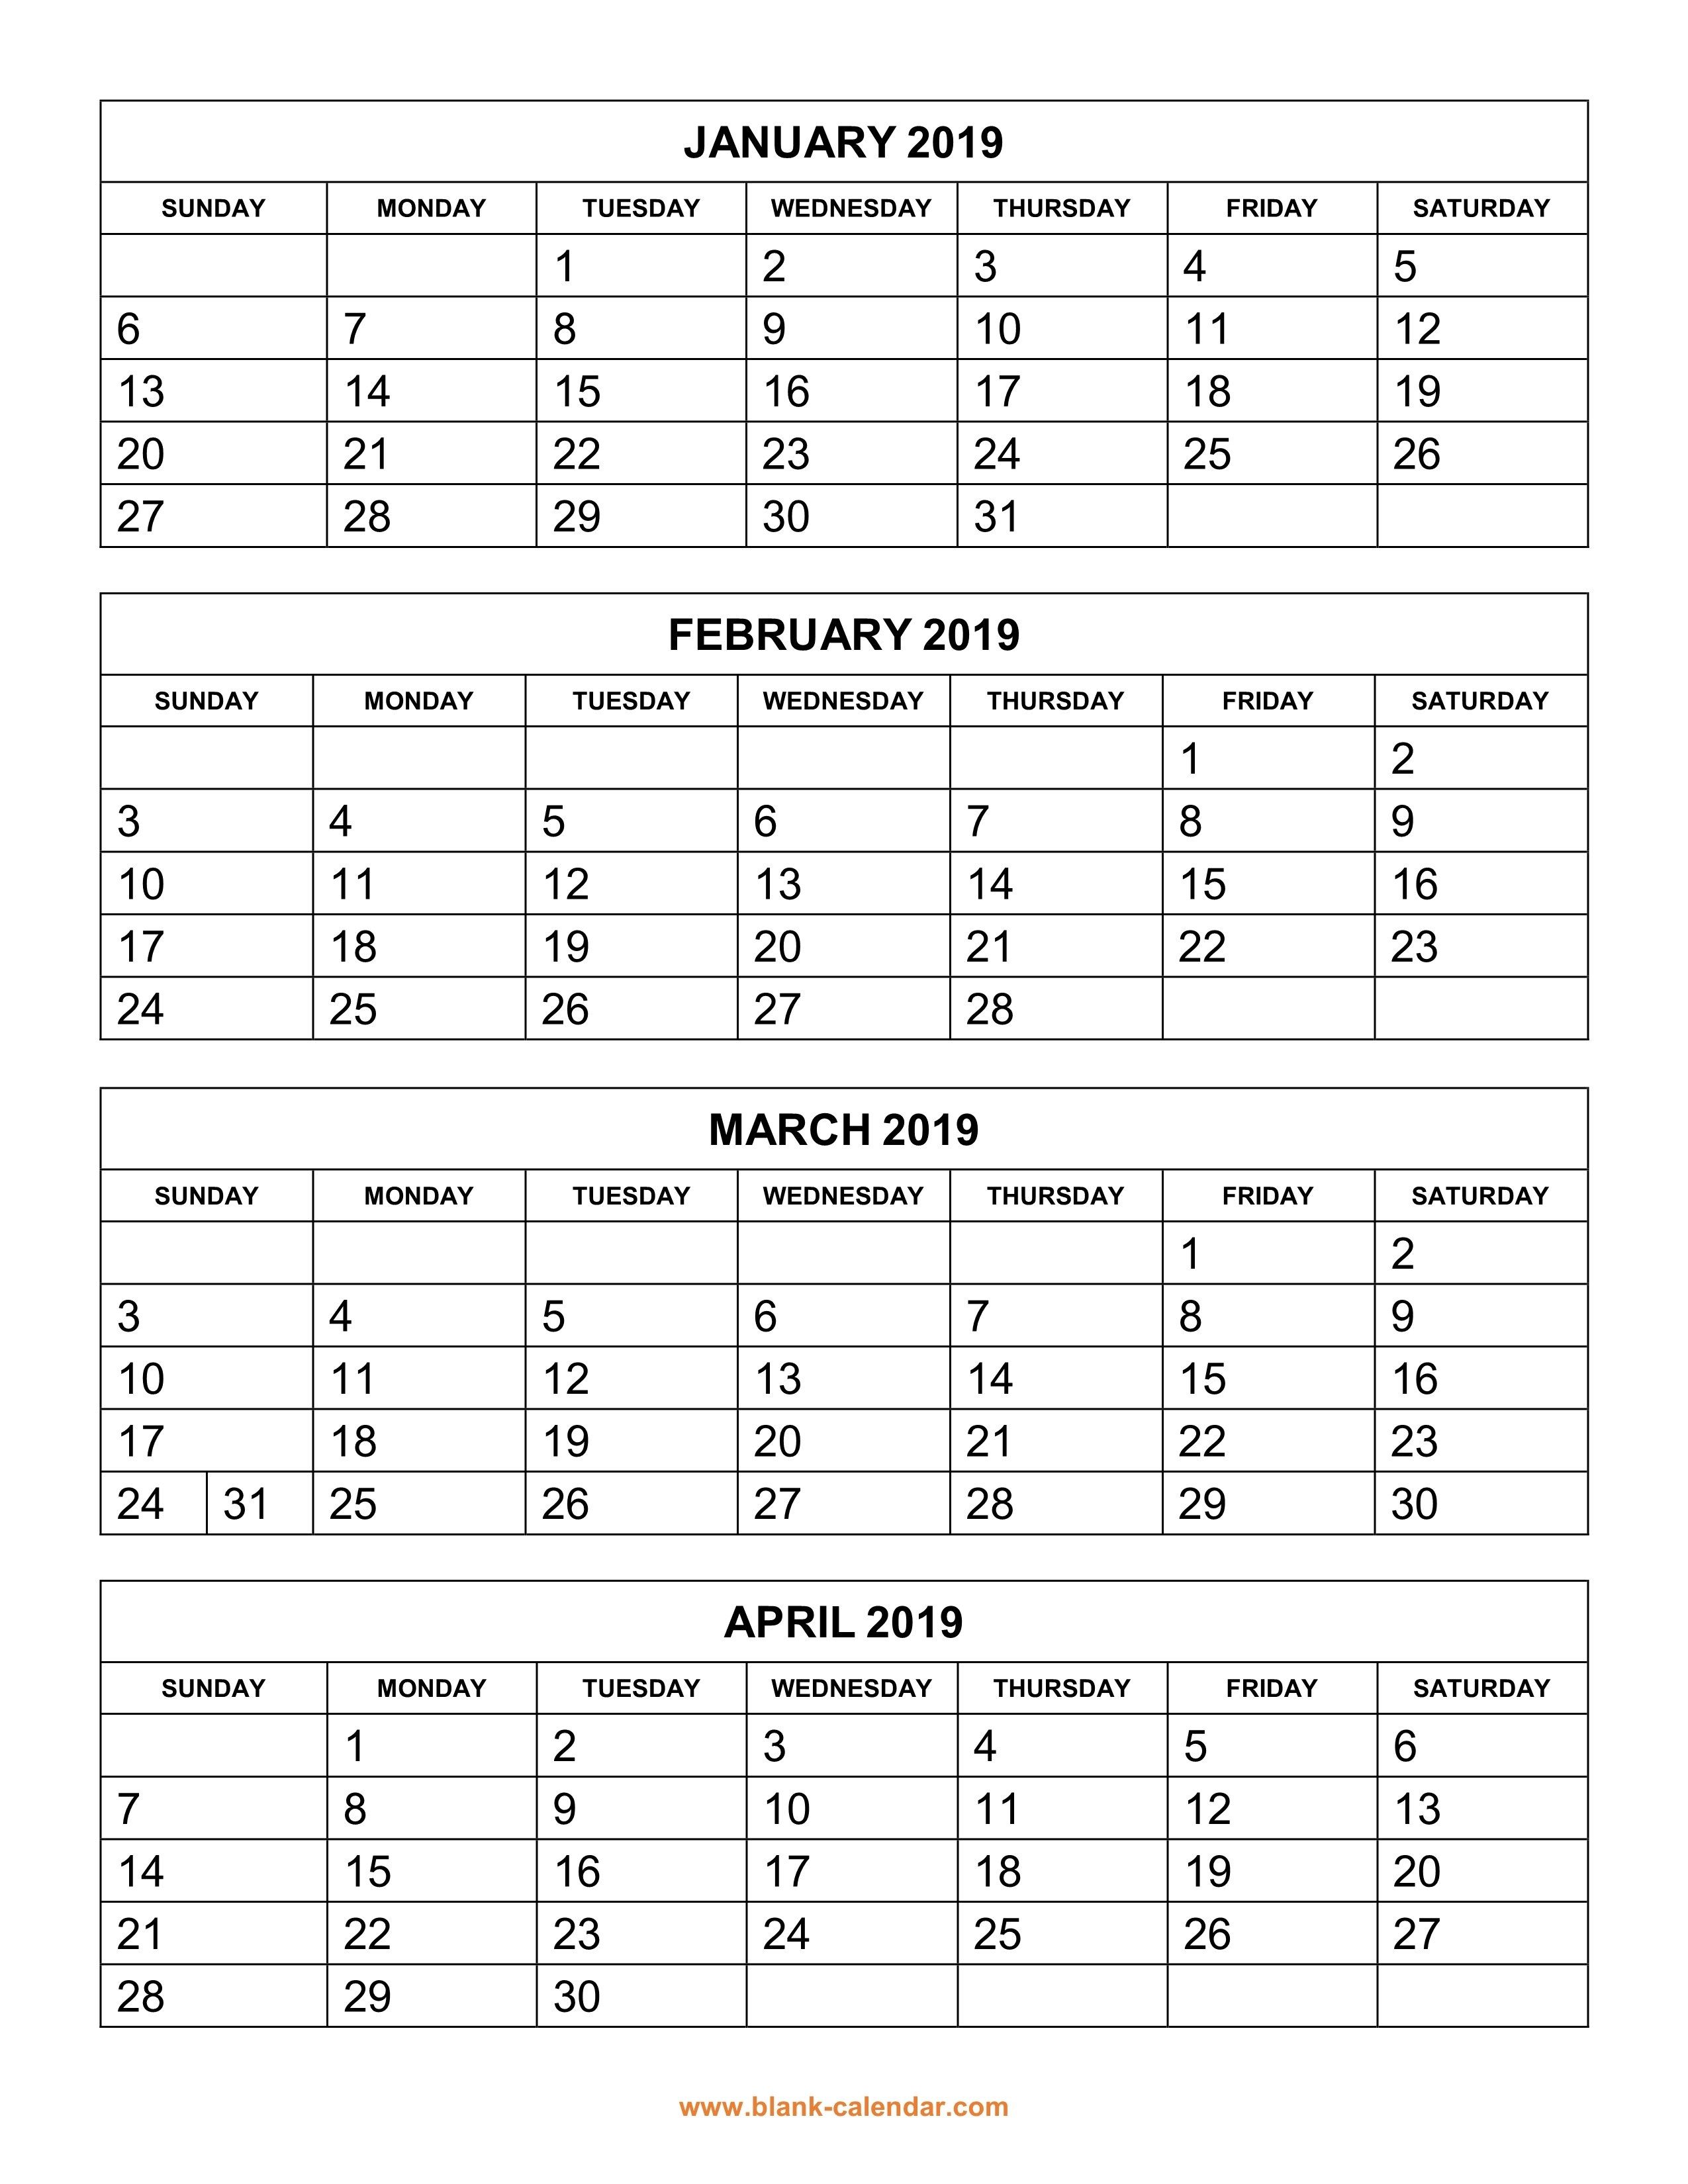 Free Download Printable Calendar 2019, 4 Months Per Page, 3 Pages 2019 Calendar 4 Months Per Page